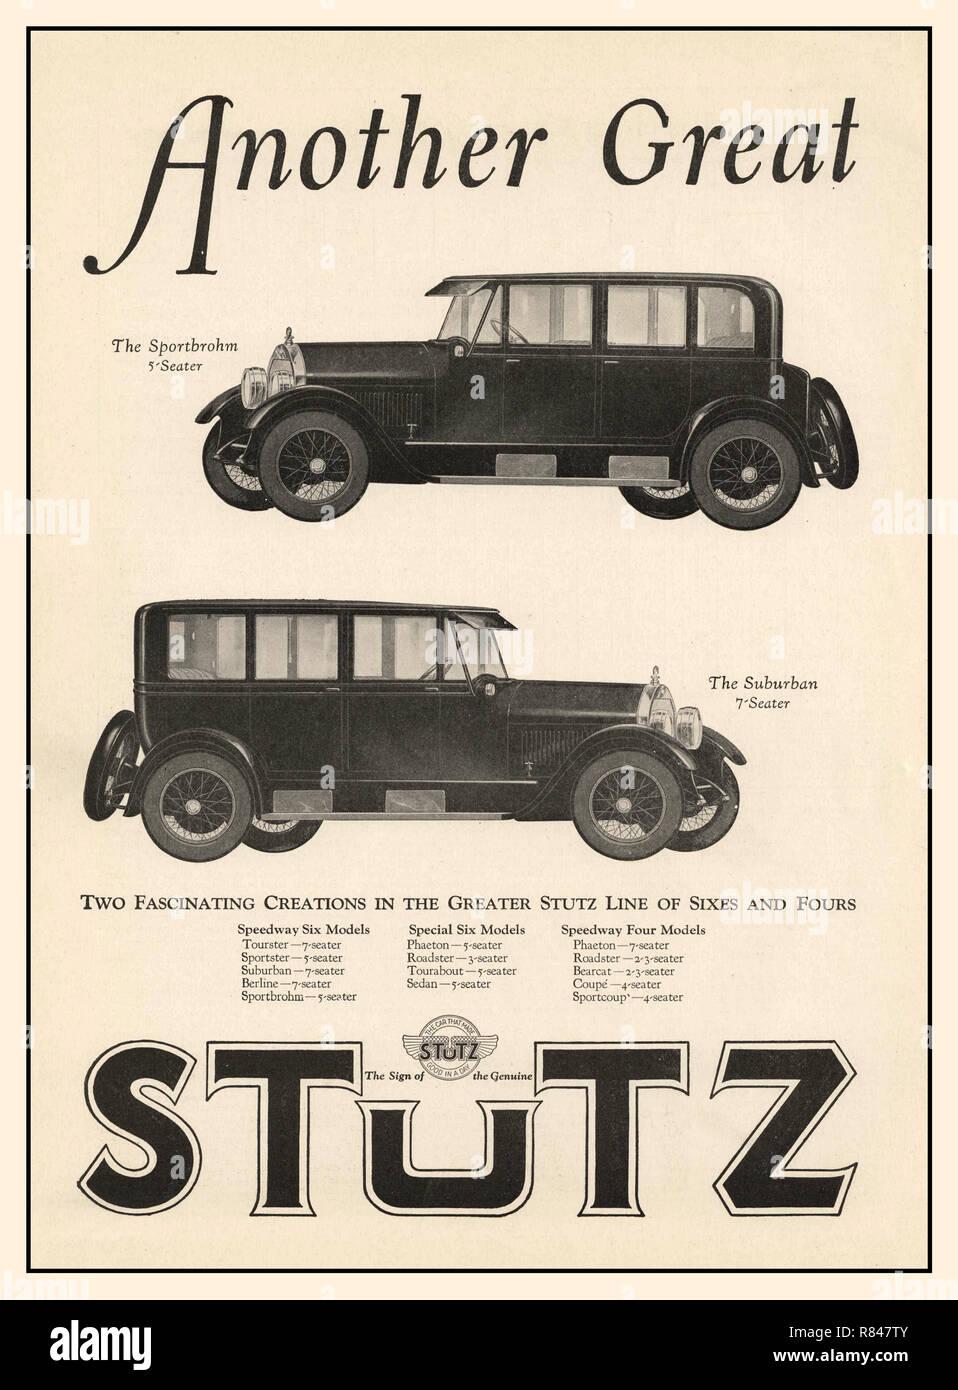 1925 Vintage Press Advertisement for American Stutz Automobiles-The Stutz Sportbrohm 5 seater and The Stutz Suburban 7 seater 4 door sedan  luxury motorcars - Stock Image